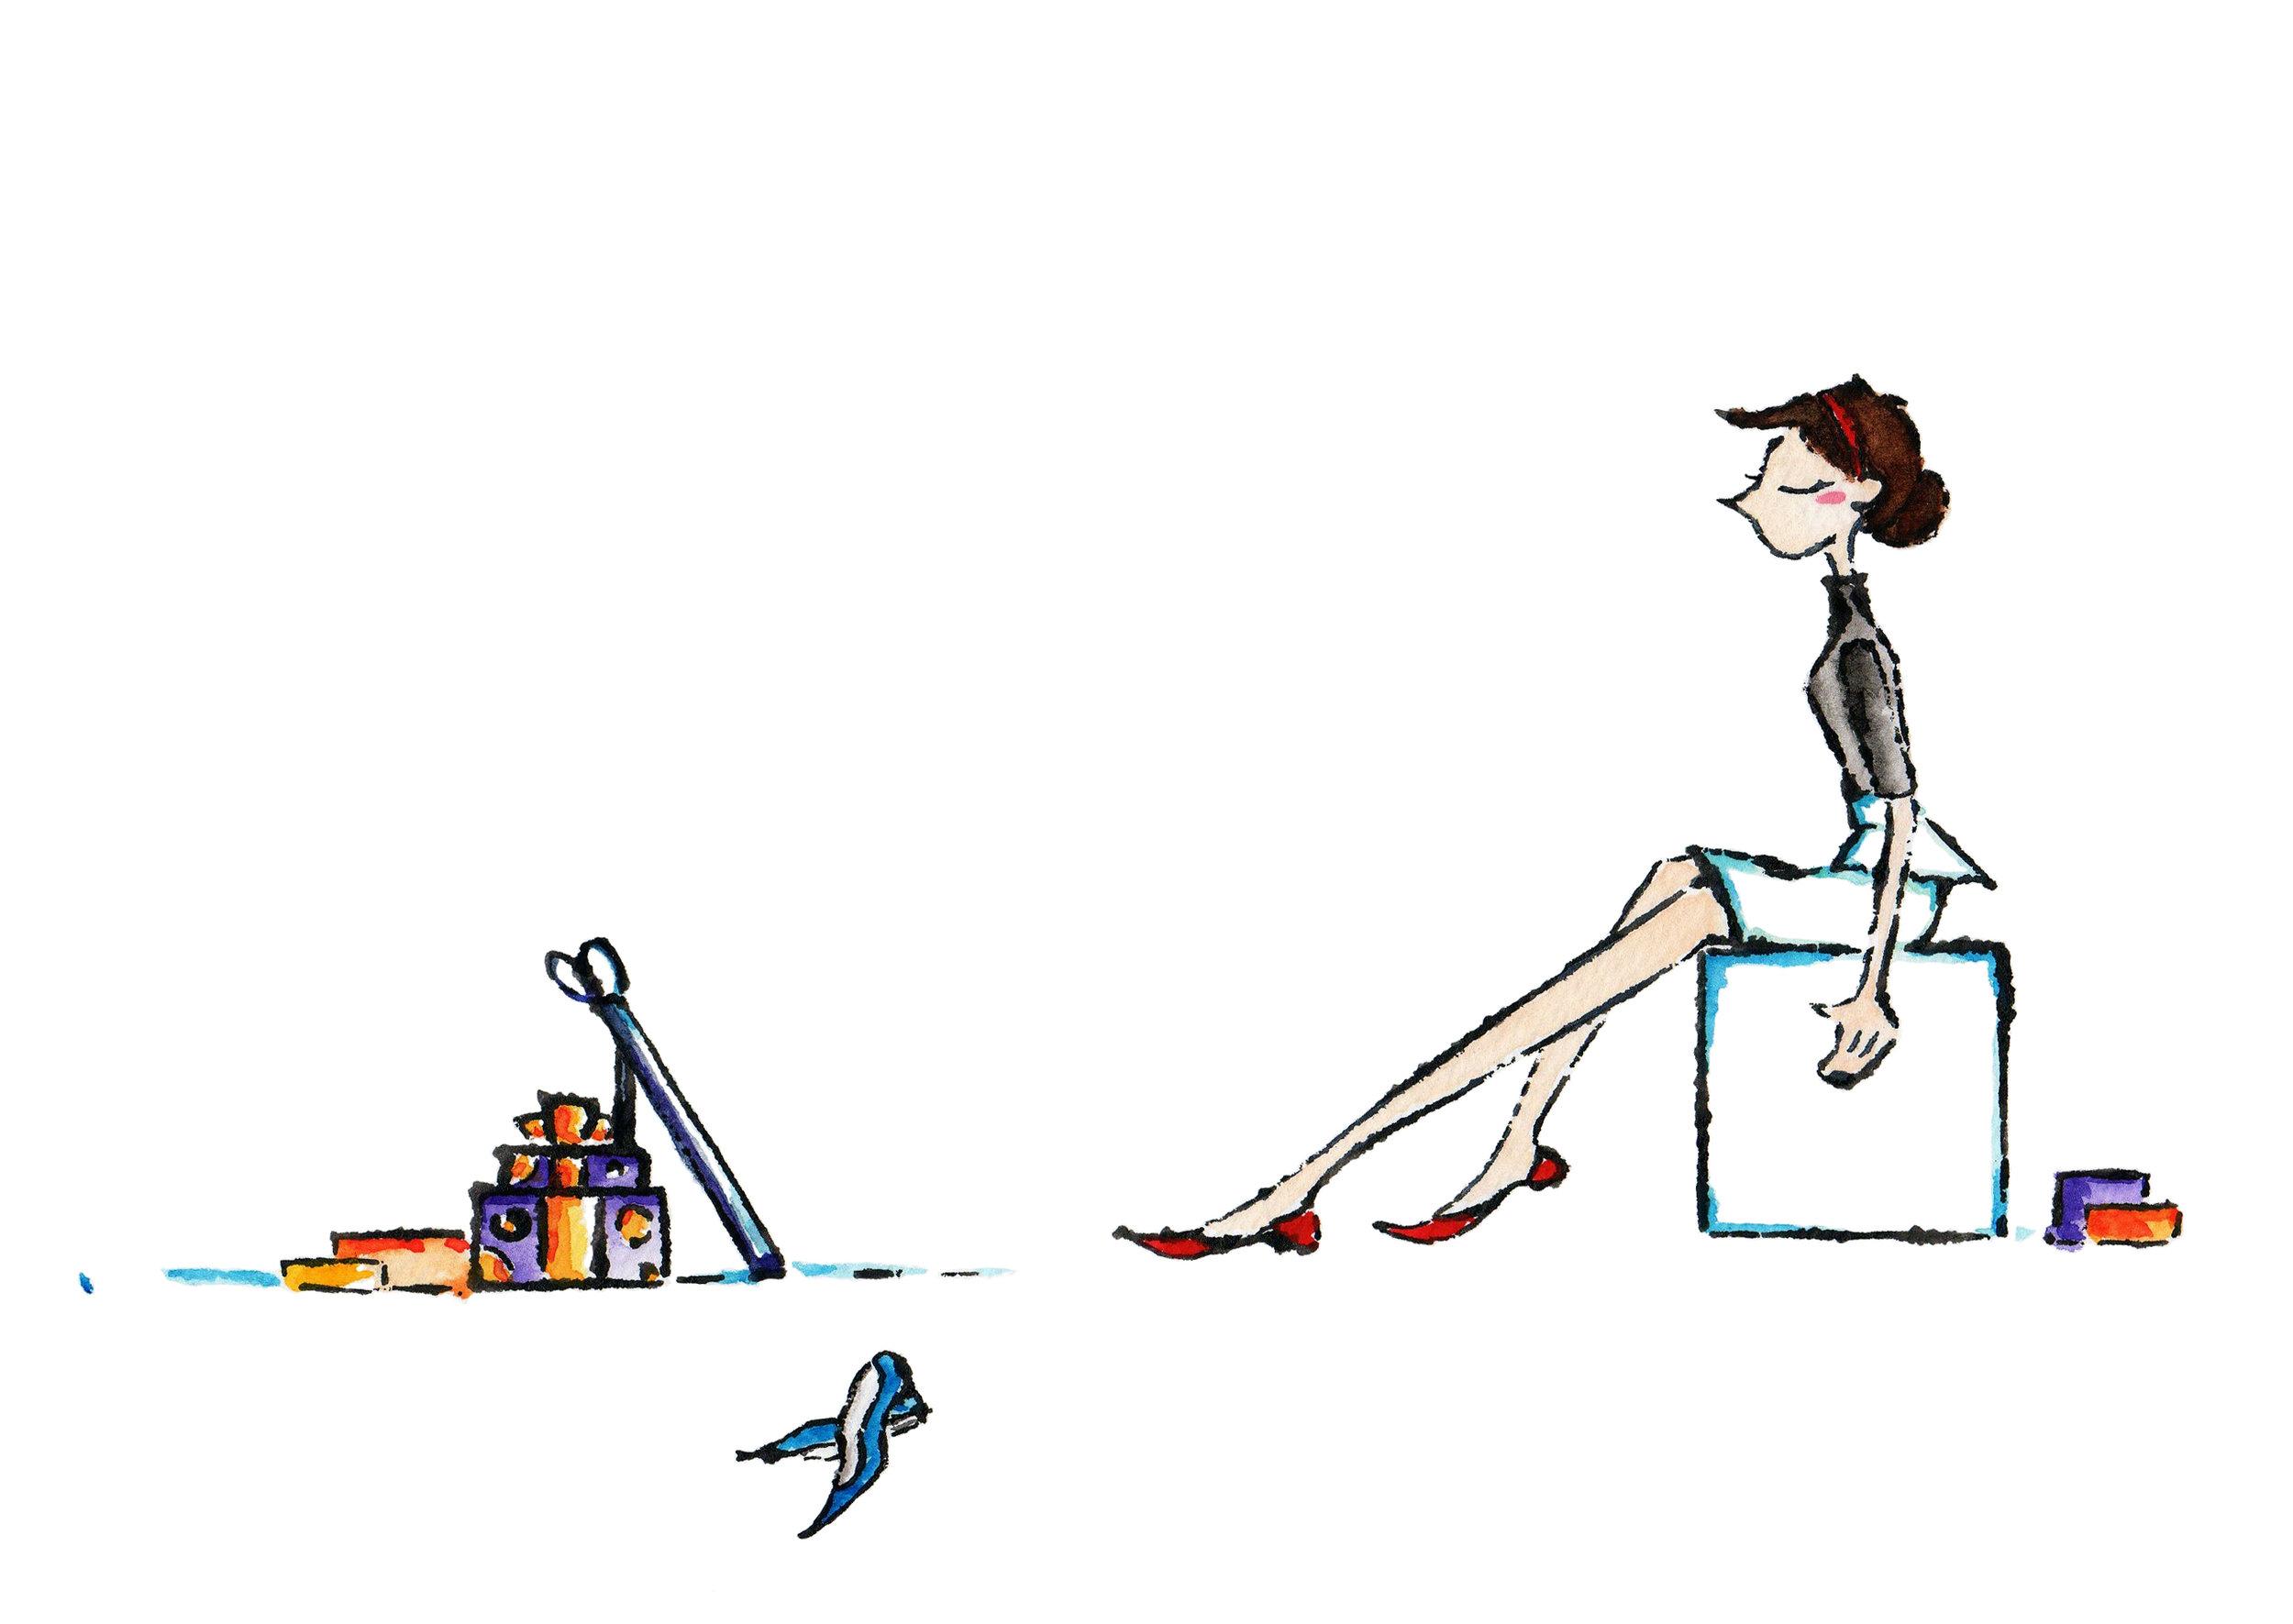 lala--shopping_jodisam.jpg